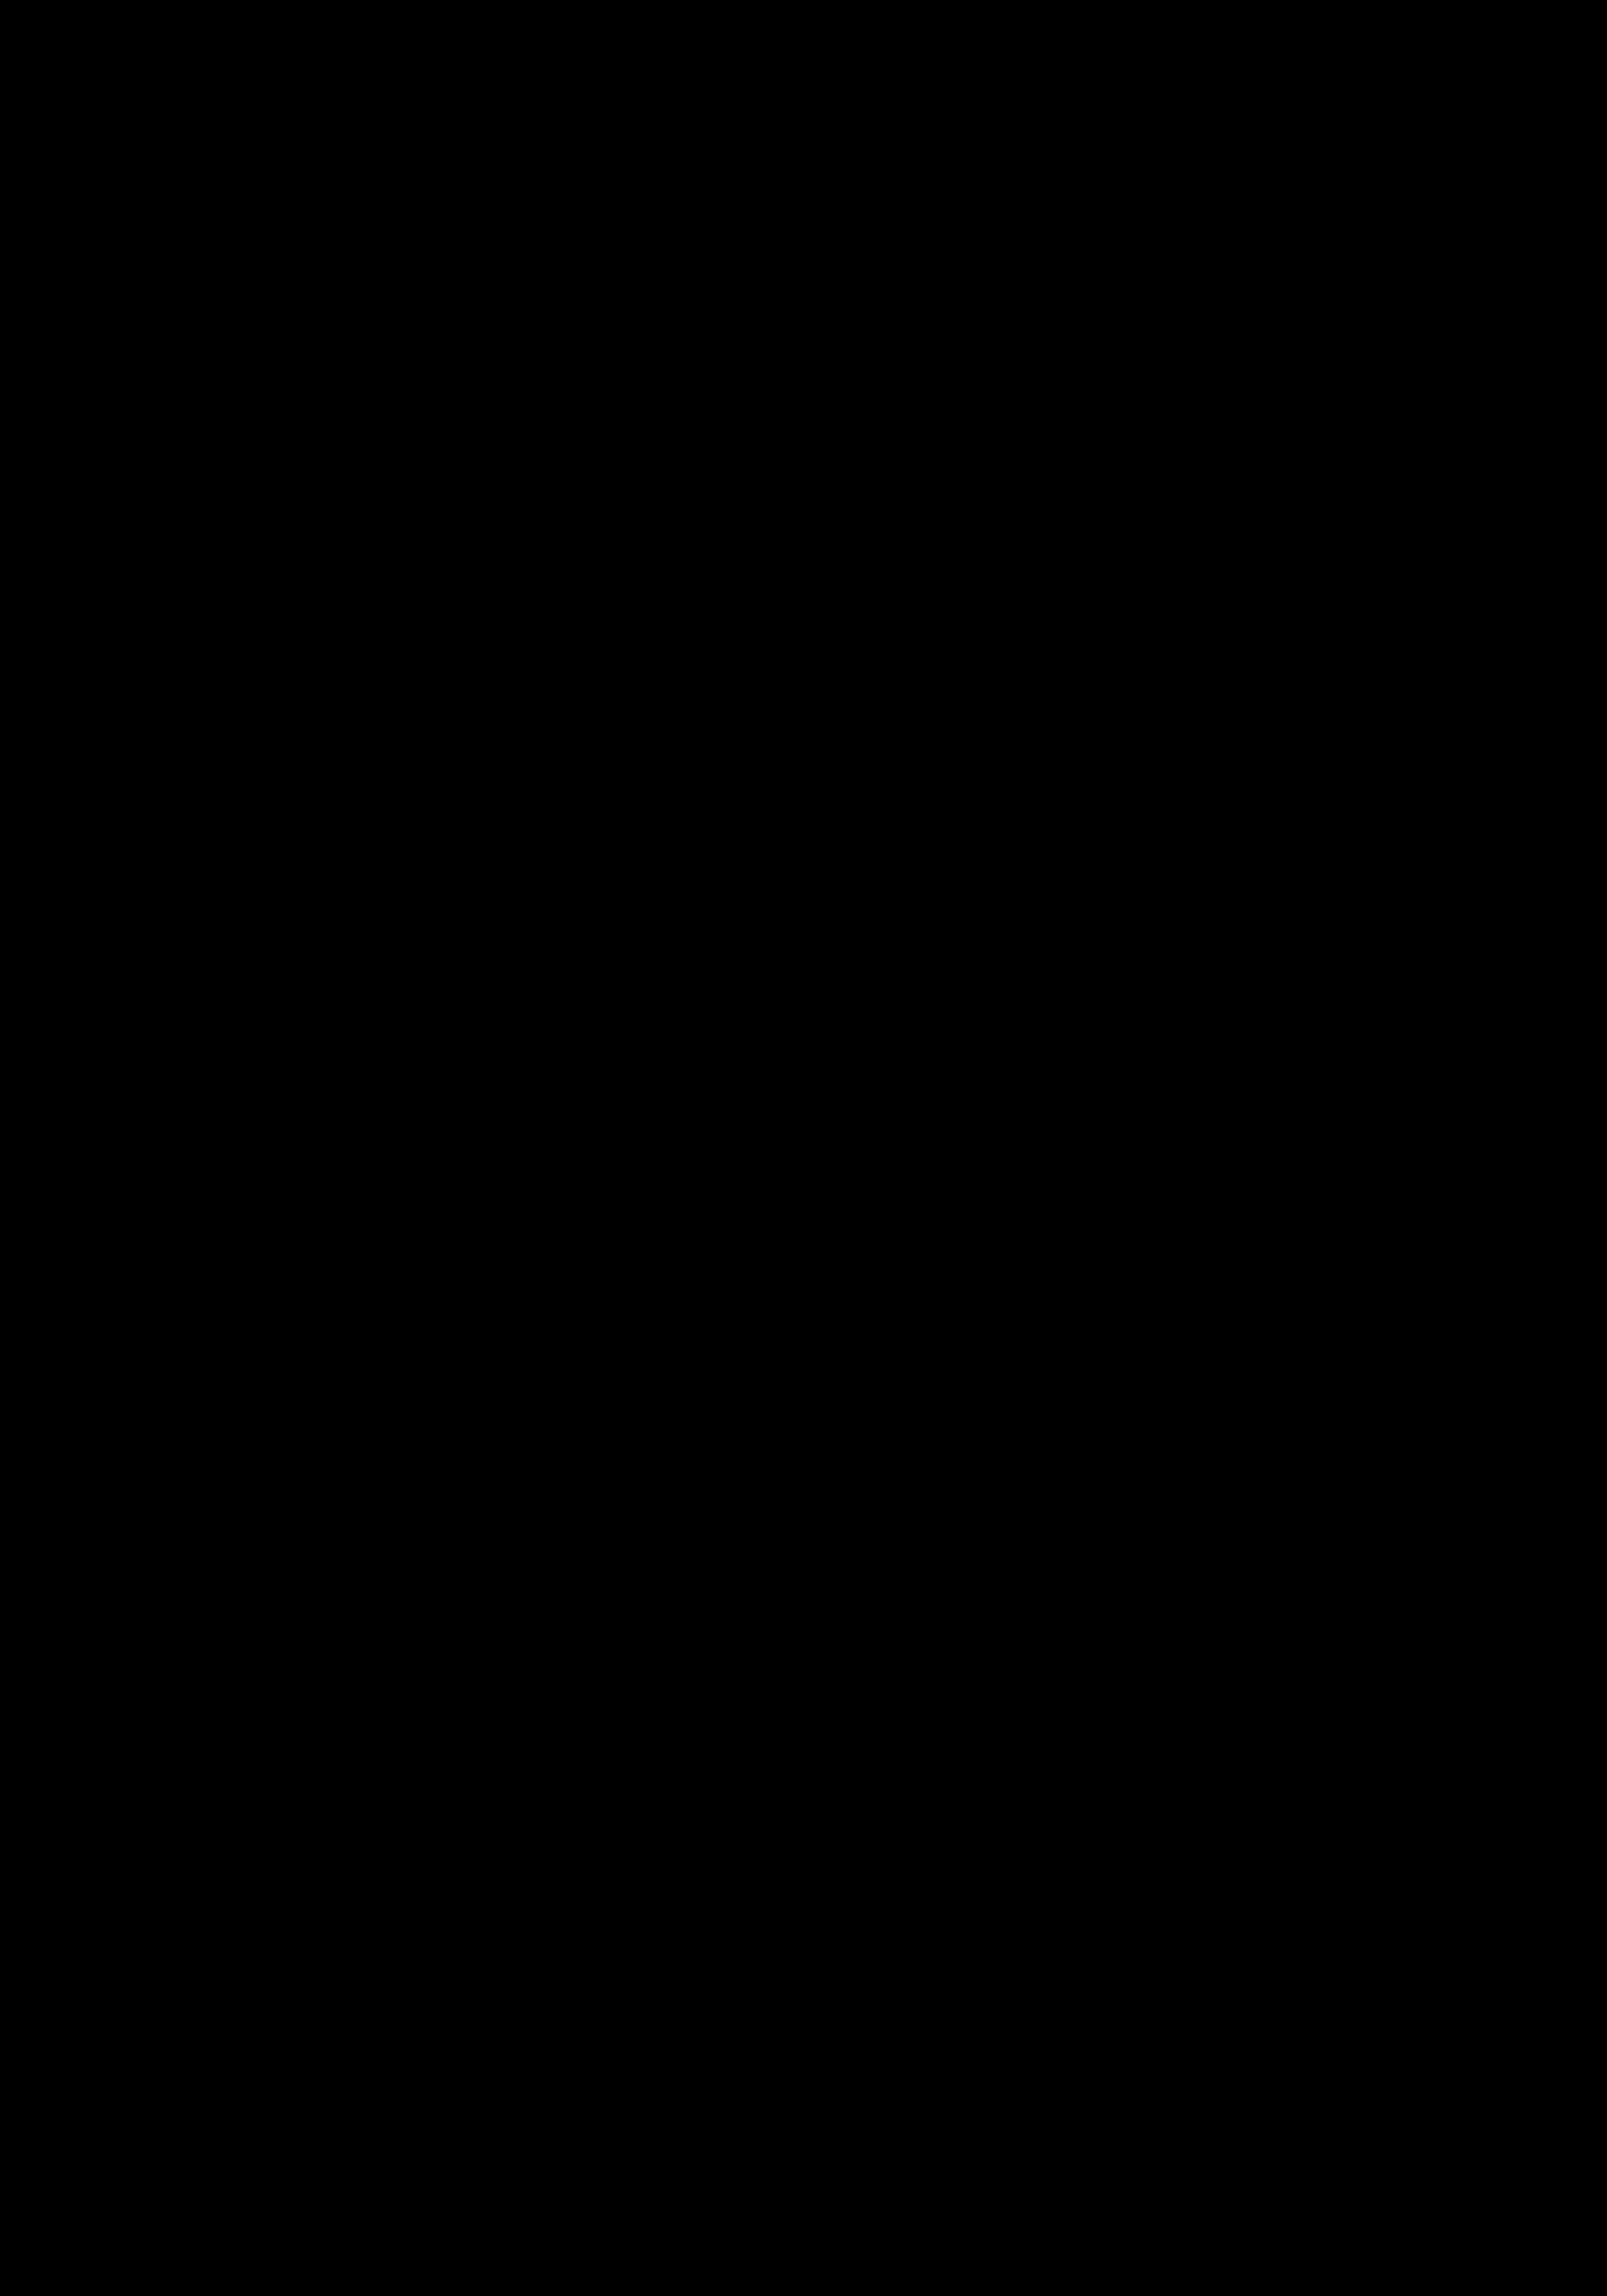 Open PlusPng.com  - Capricorn PNG